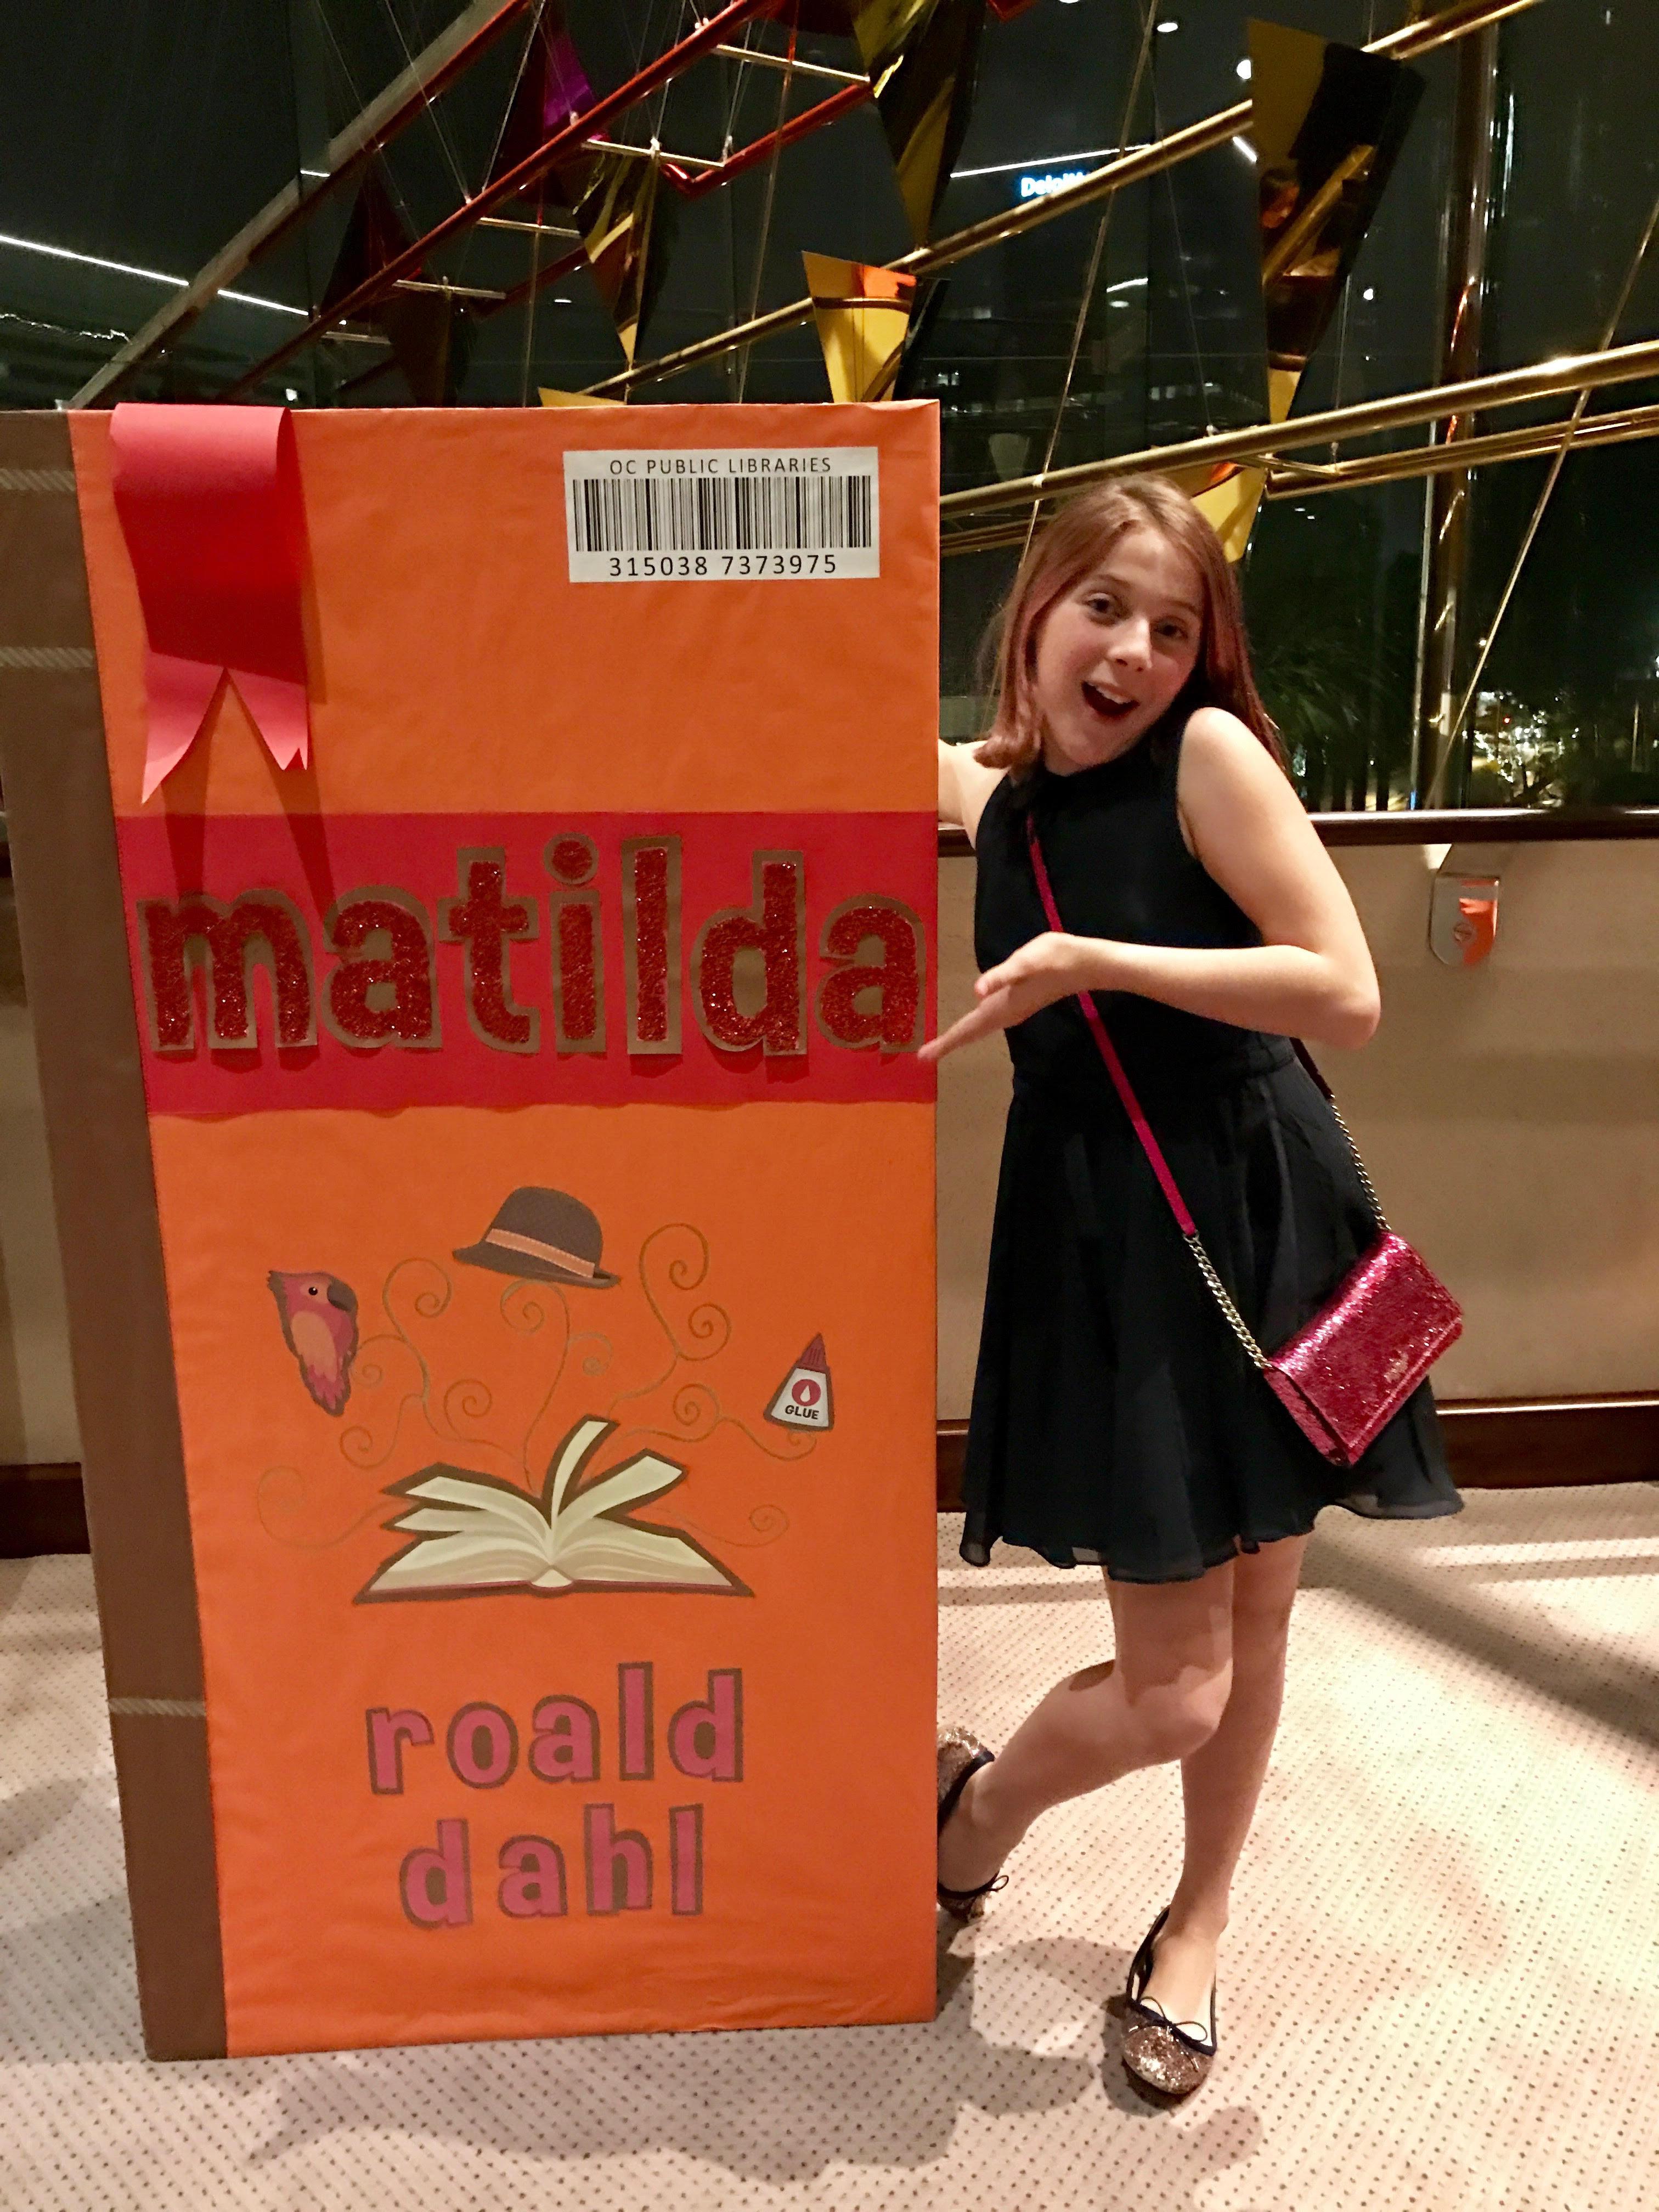 Matilda The Musical Orange County Segerstrom Center for the Arts2